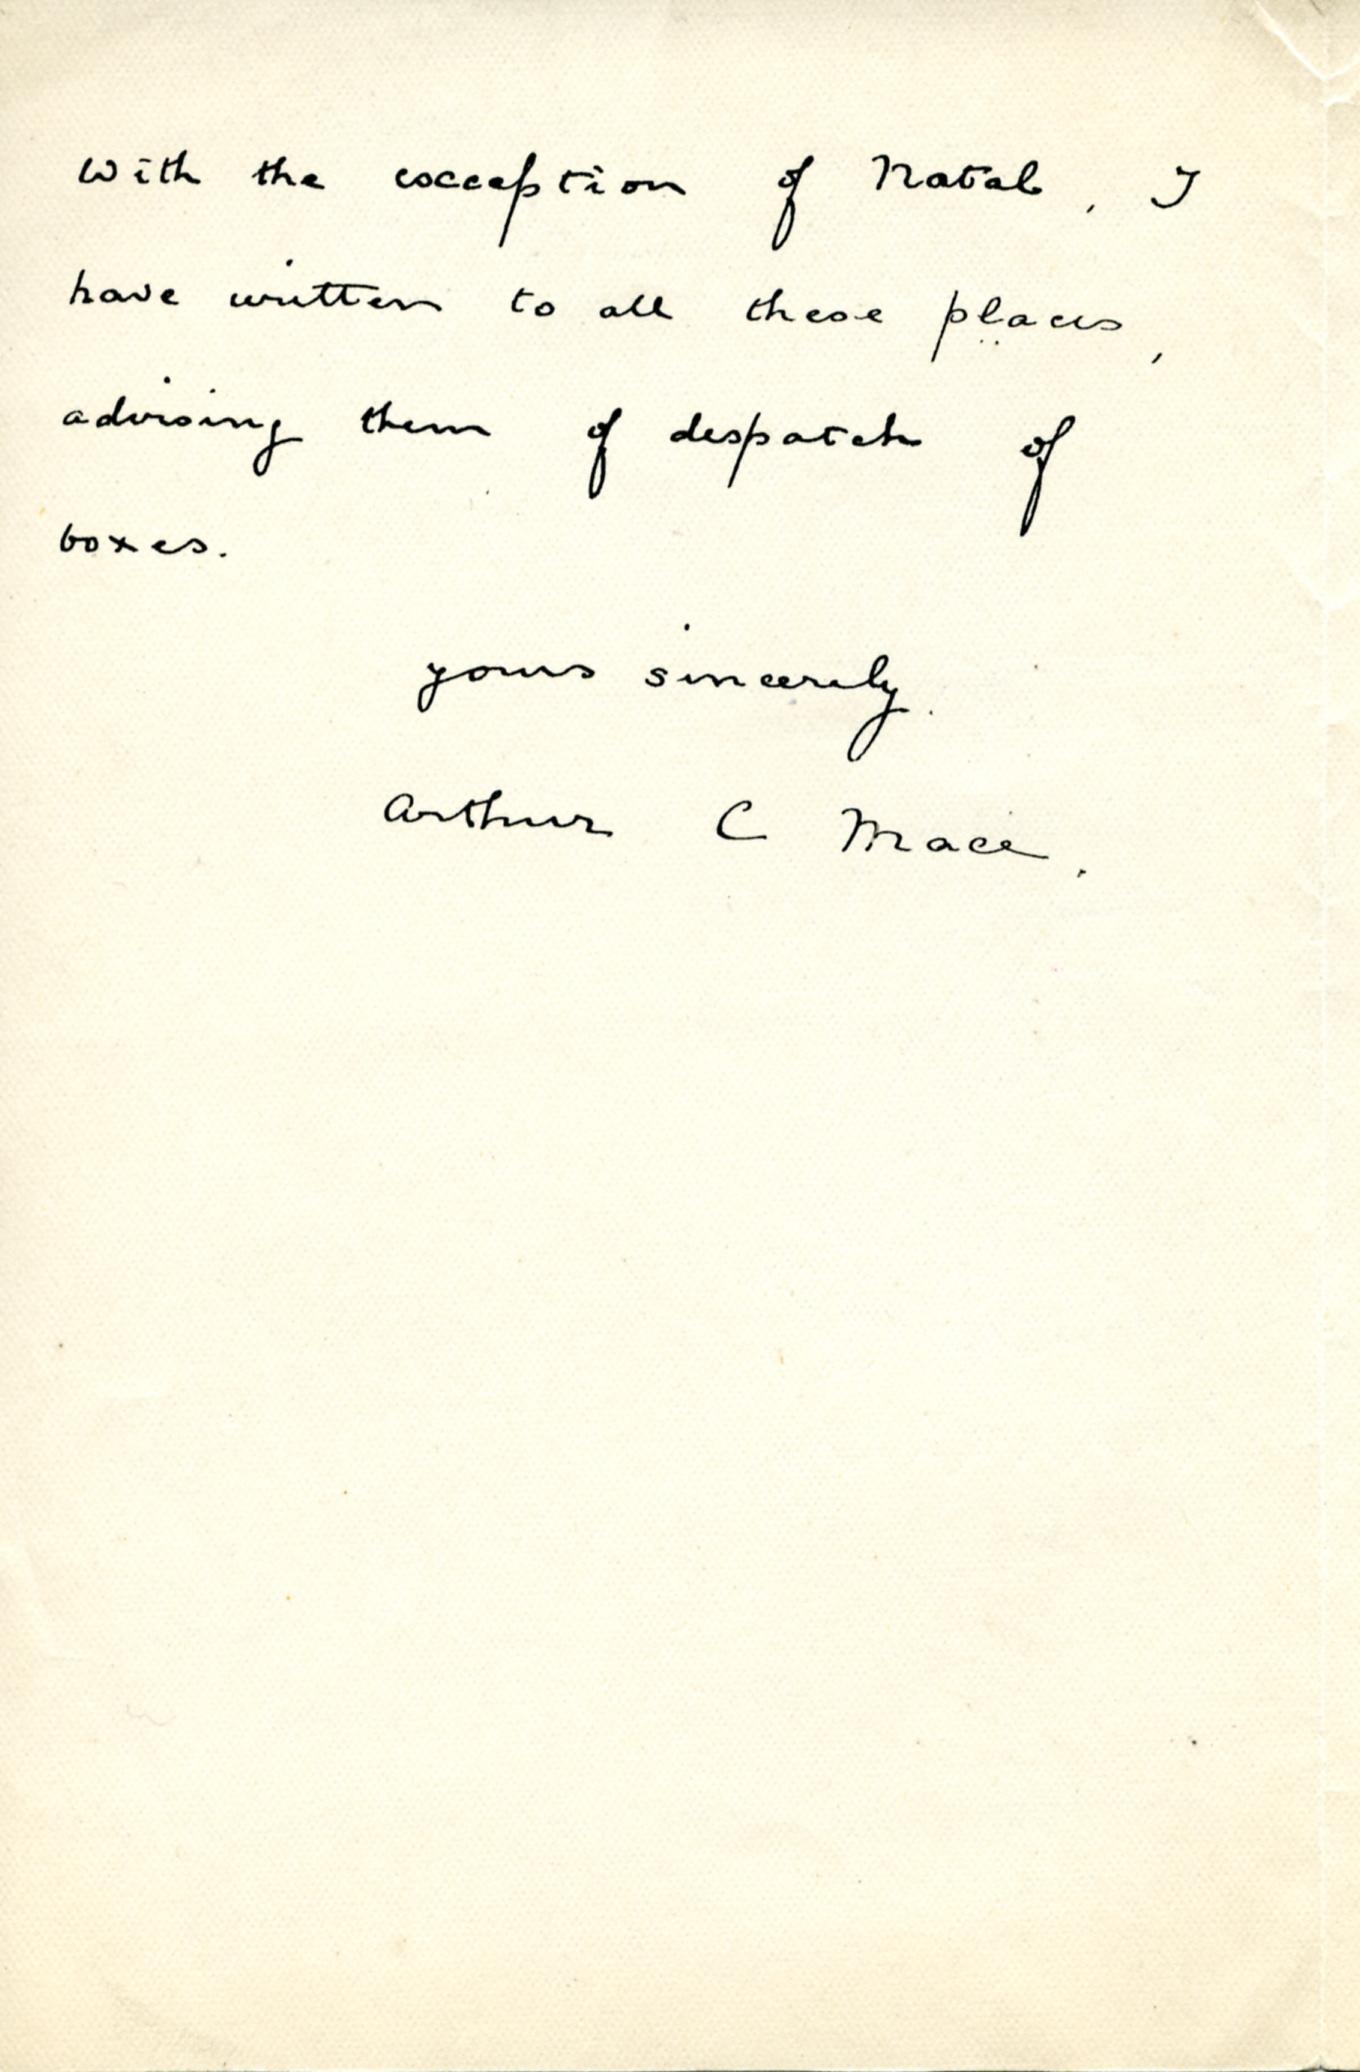 1898-1899 Hu, 1899-1900 Abydos DIST.17.02b